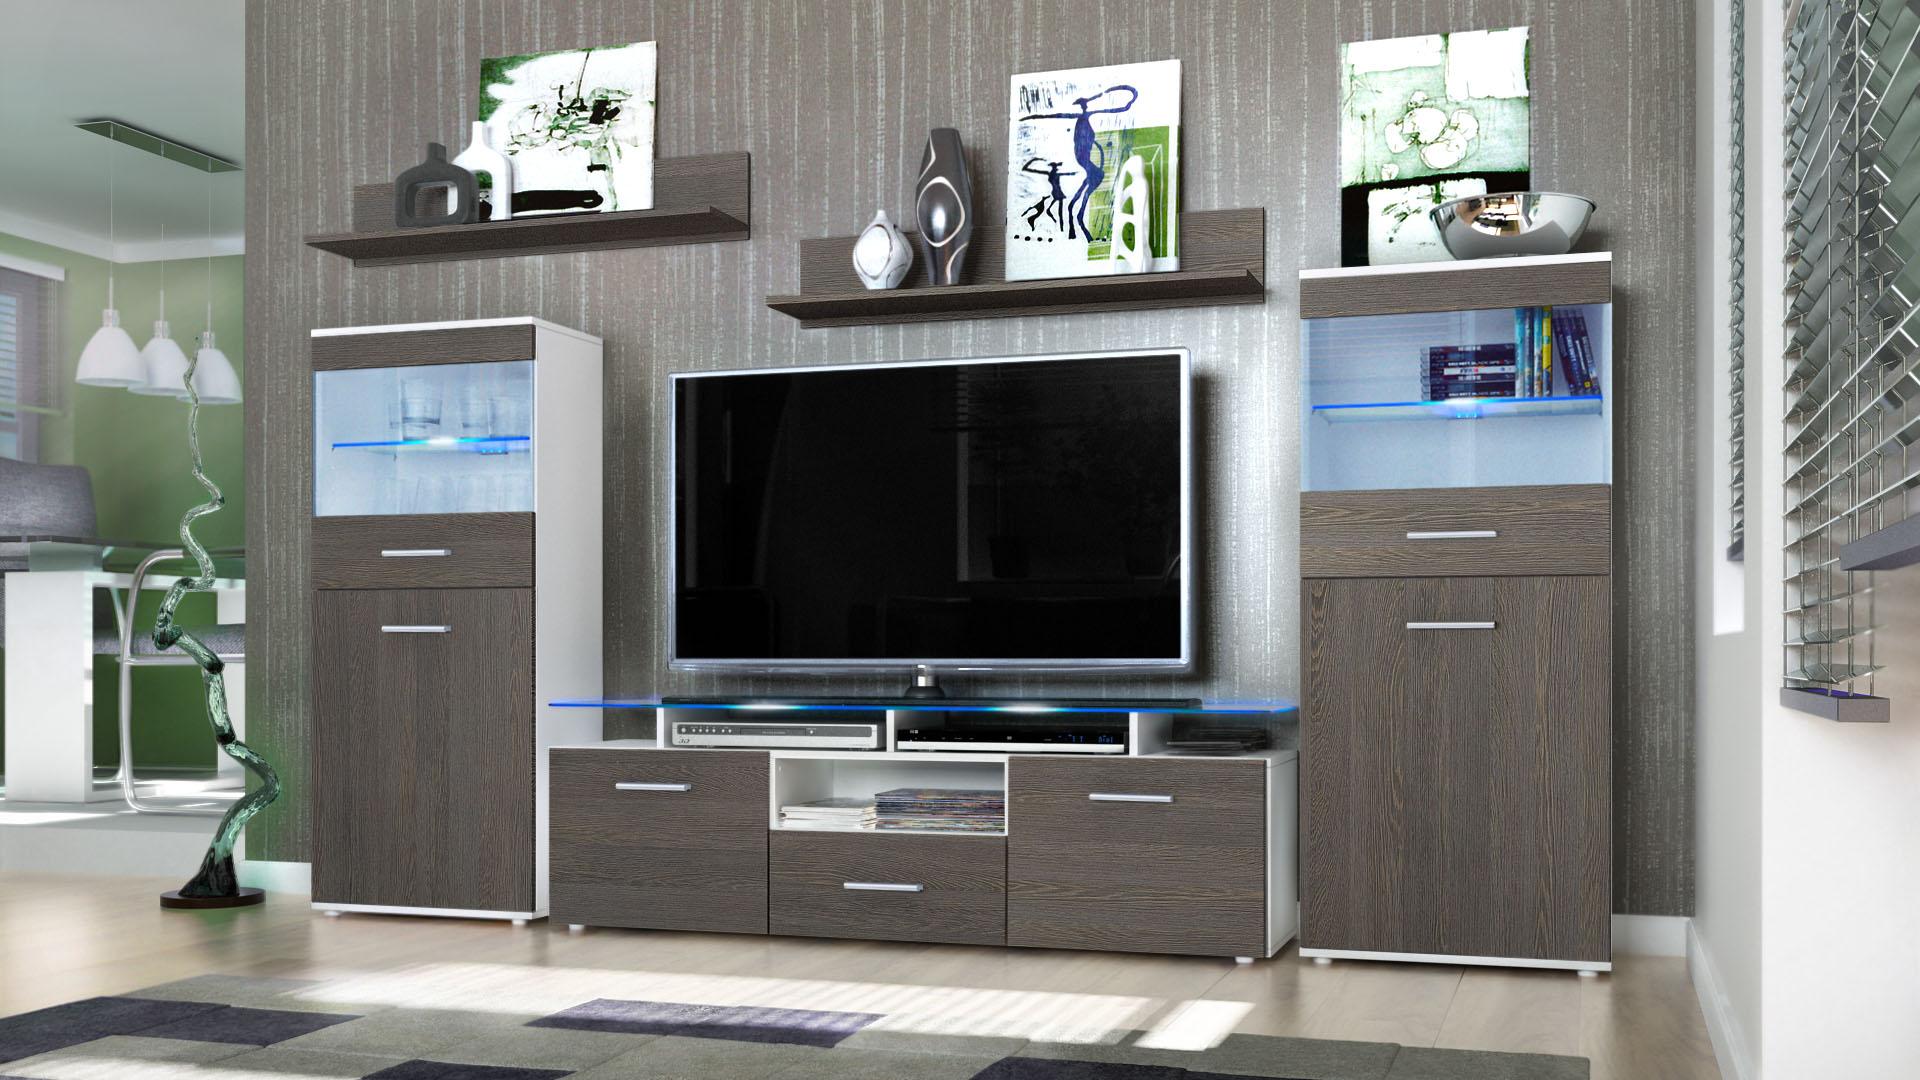 wall unit living room furniture almada white high gloss Contemporary Modular Wall Units wall unit living room furniture